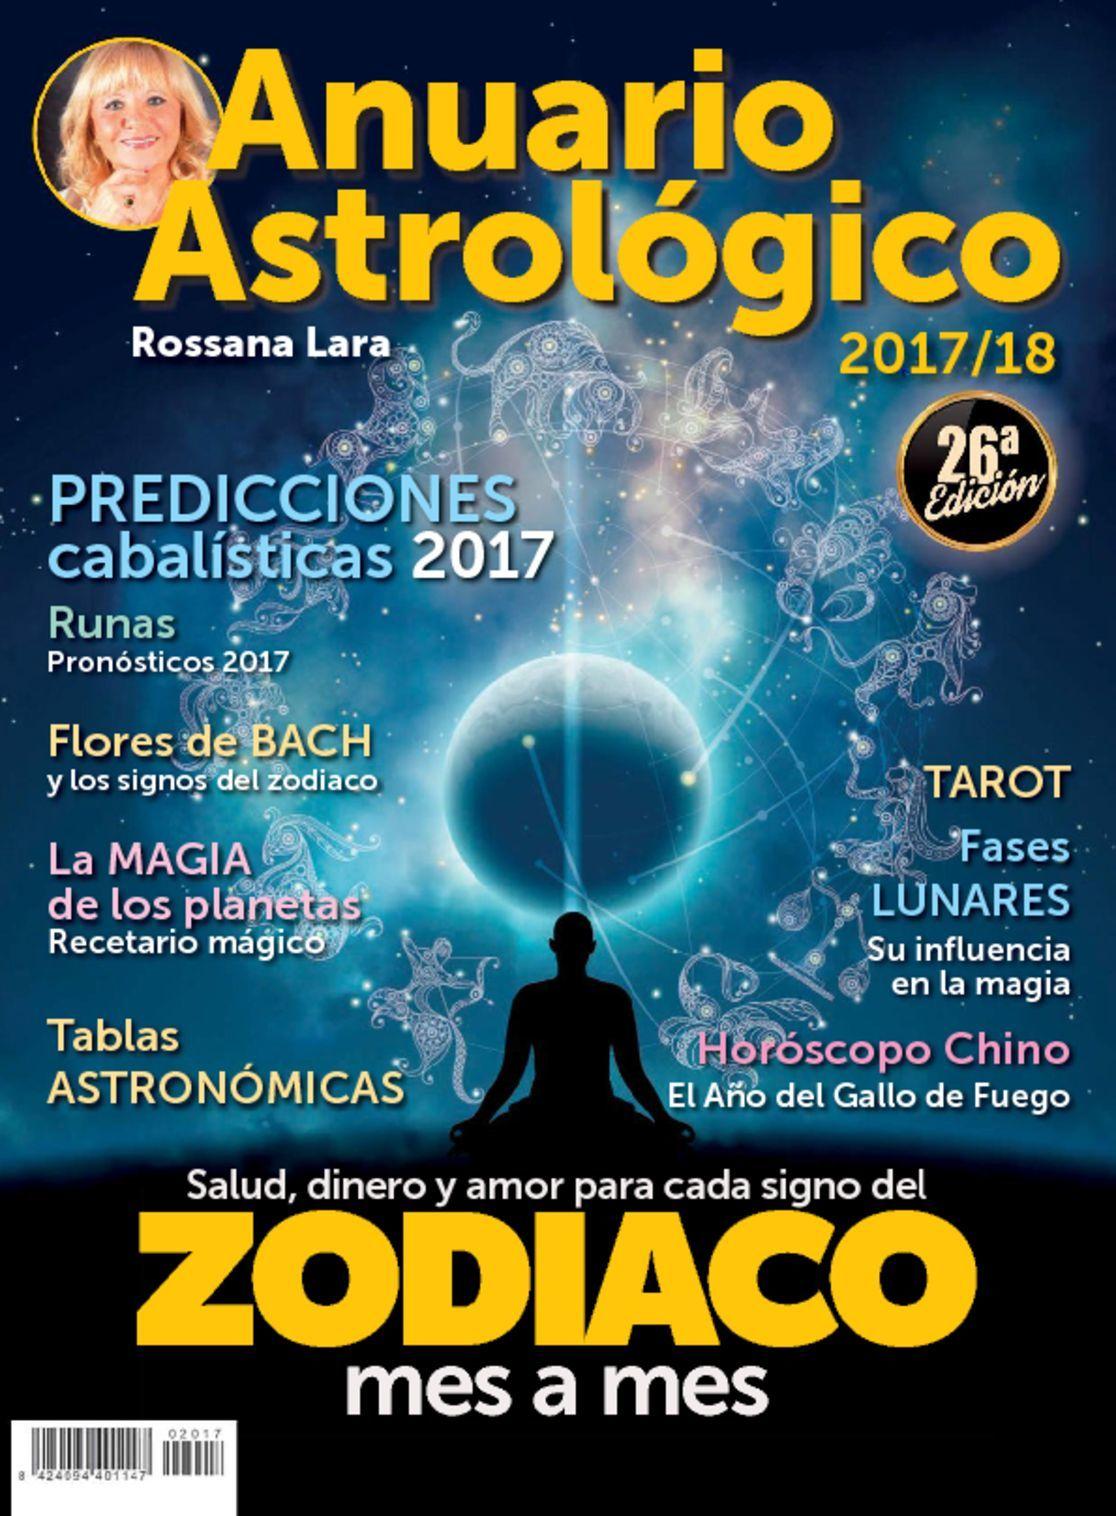 Anuario Astrológico 2016/17 (Digital)